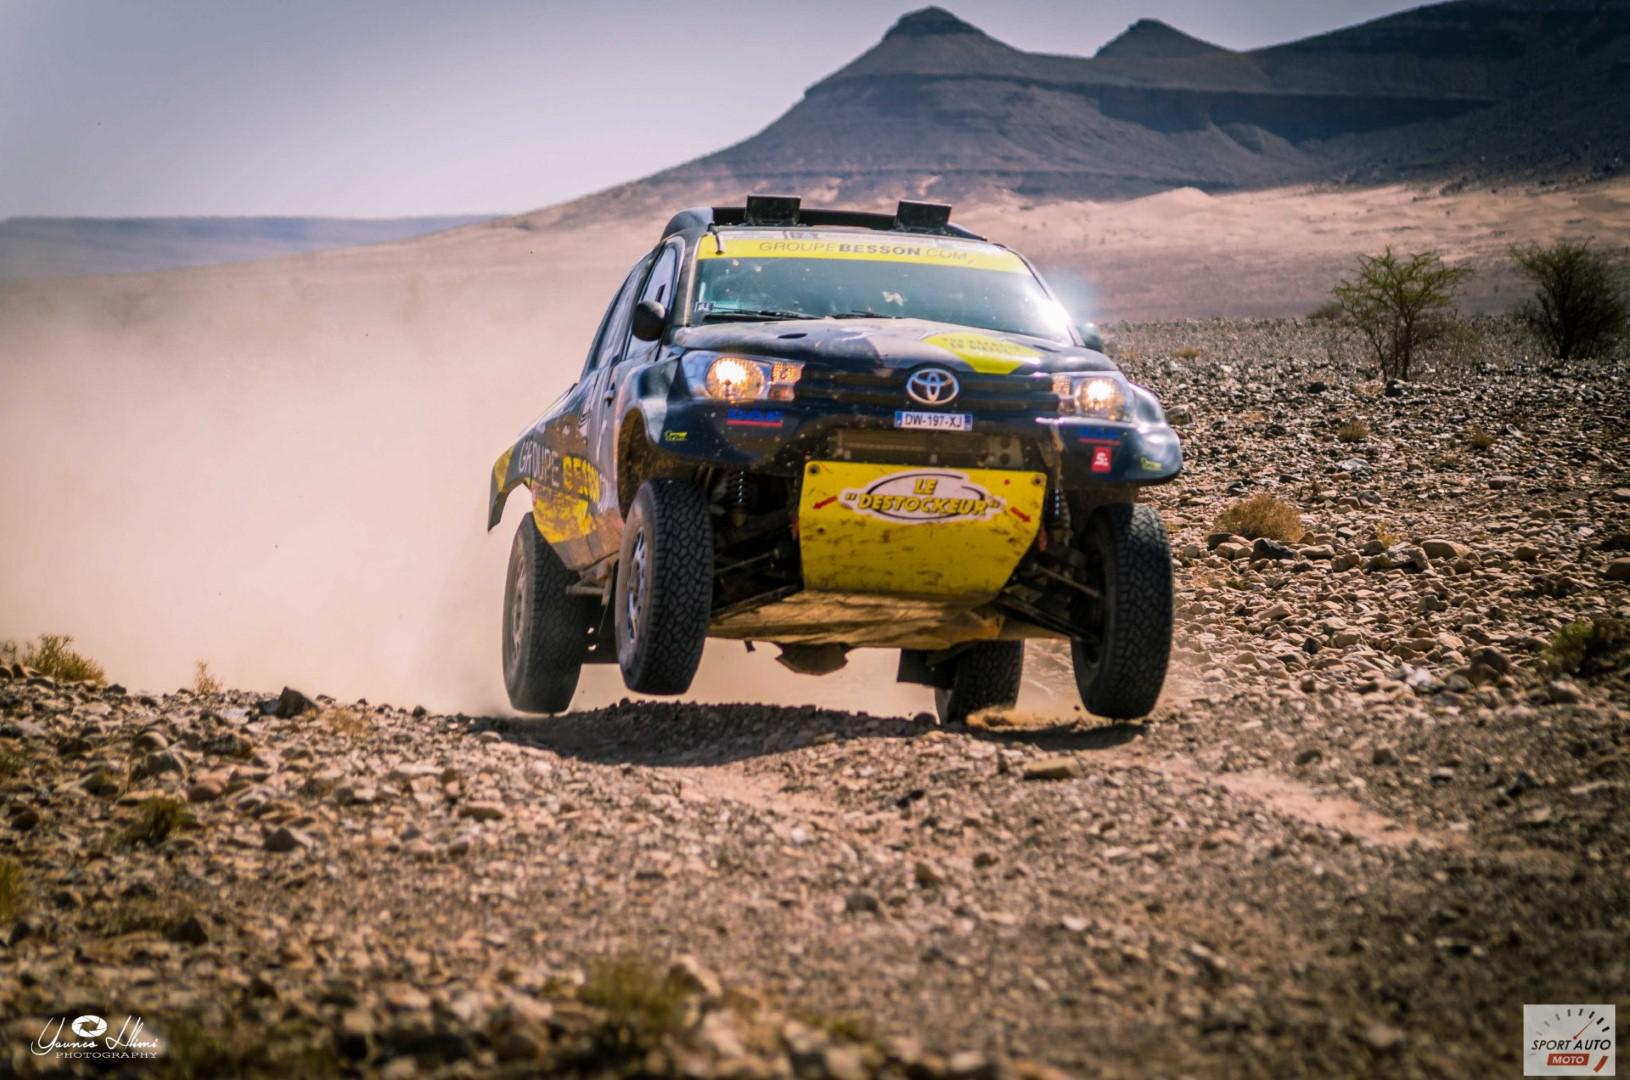 Rallye Hearts of Morocco 2017 : Lionel Baud vainqueur du jour